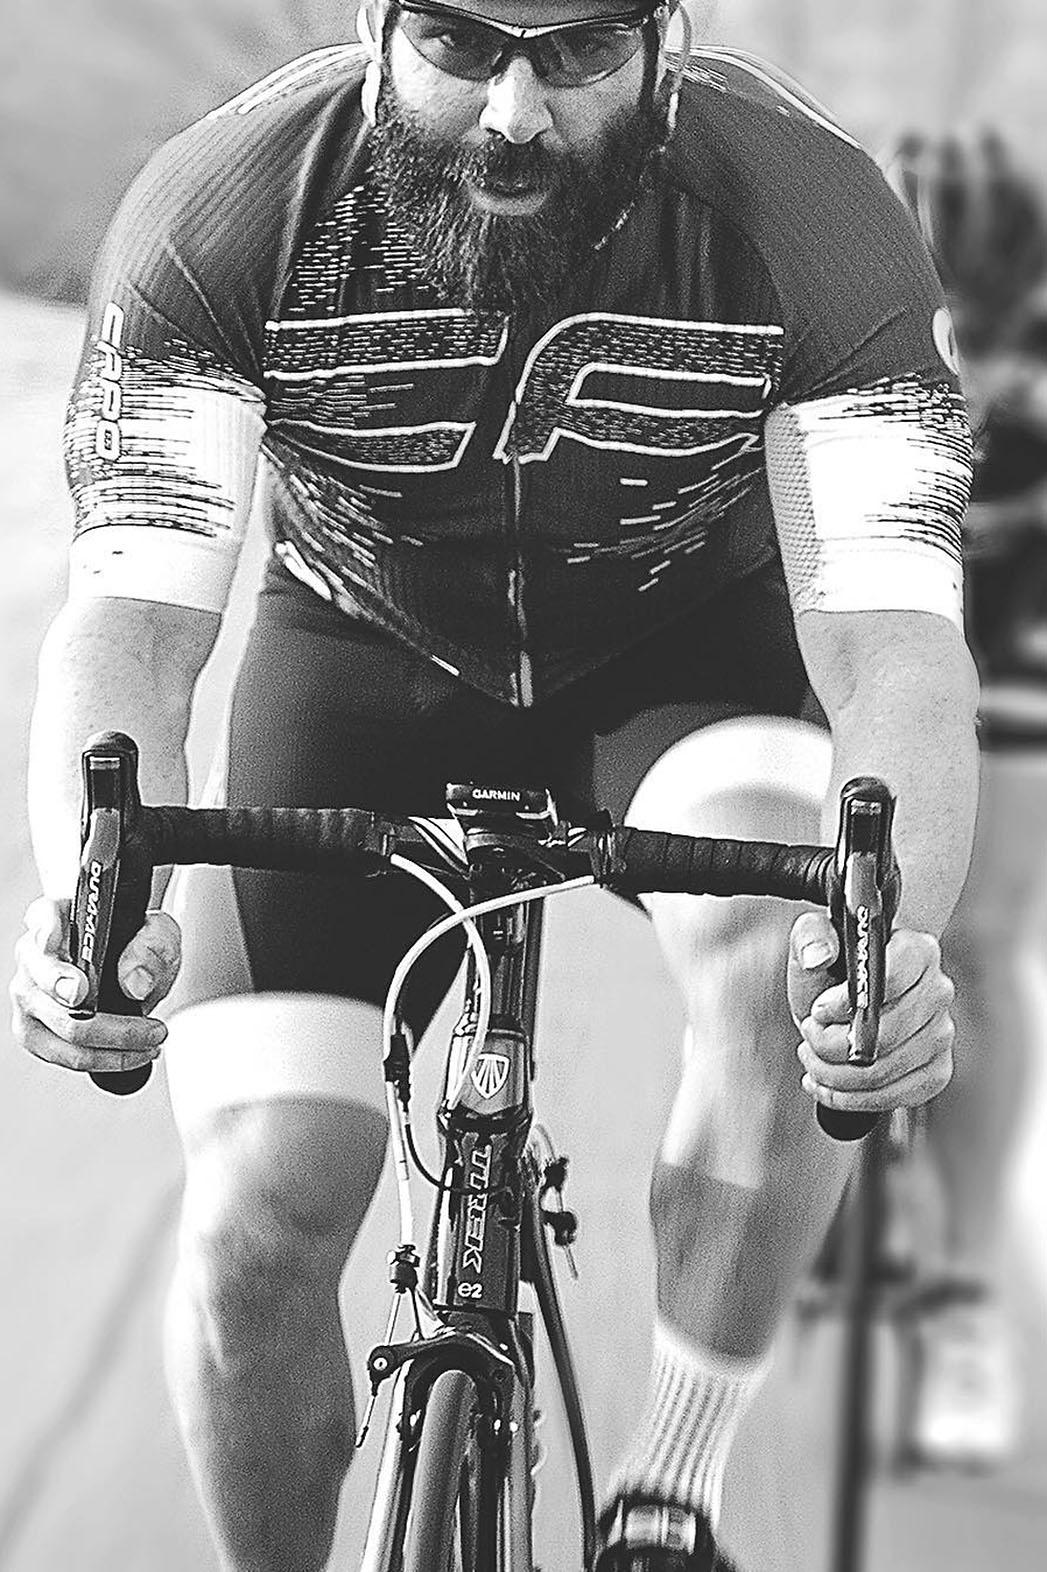 bilzerian_bike_IG - P 2016